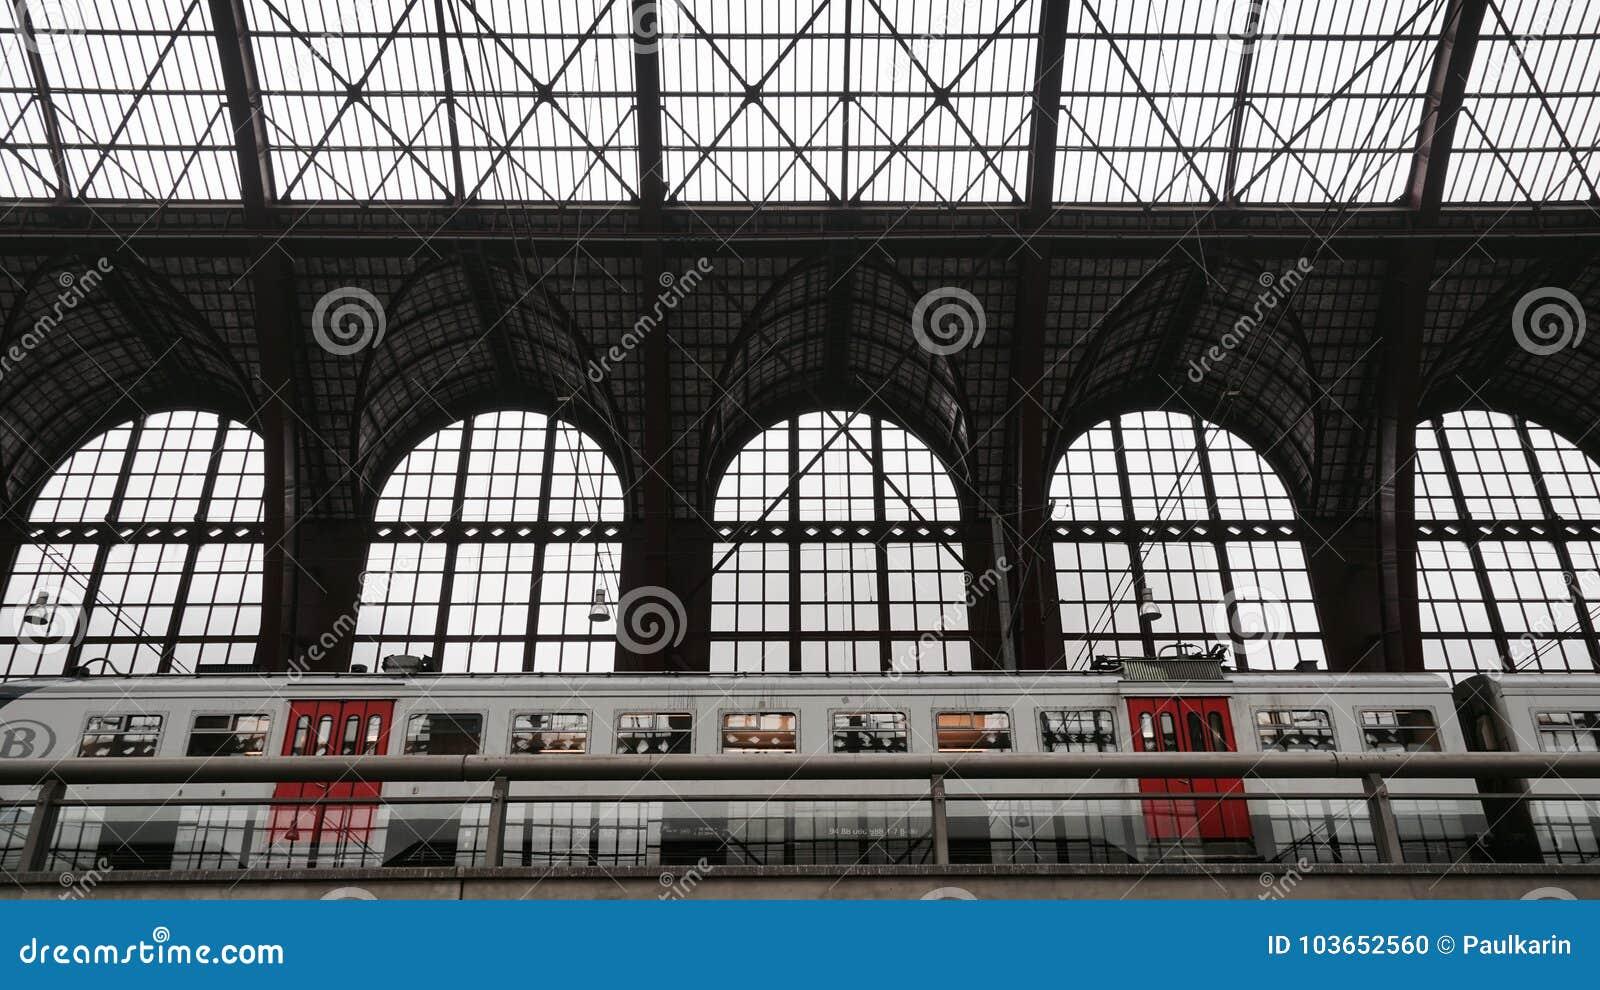 Antwerp central drevstation